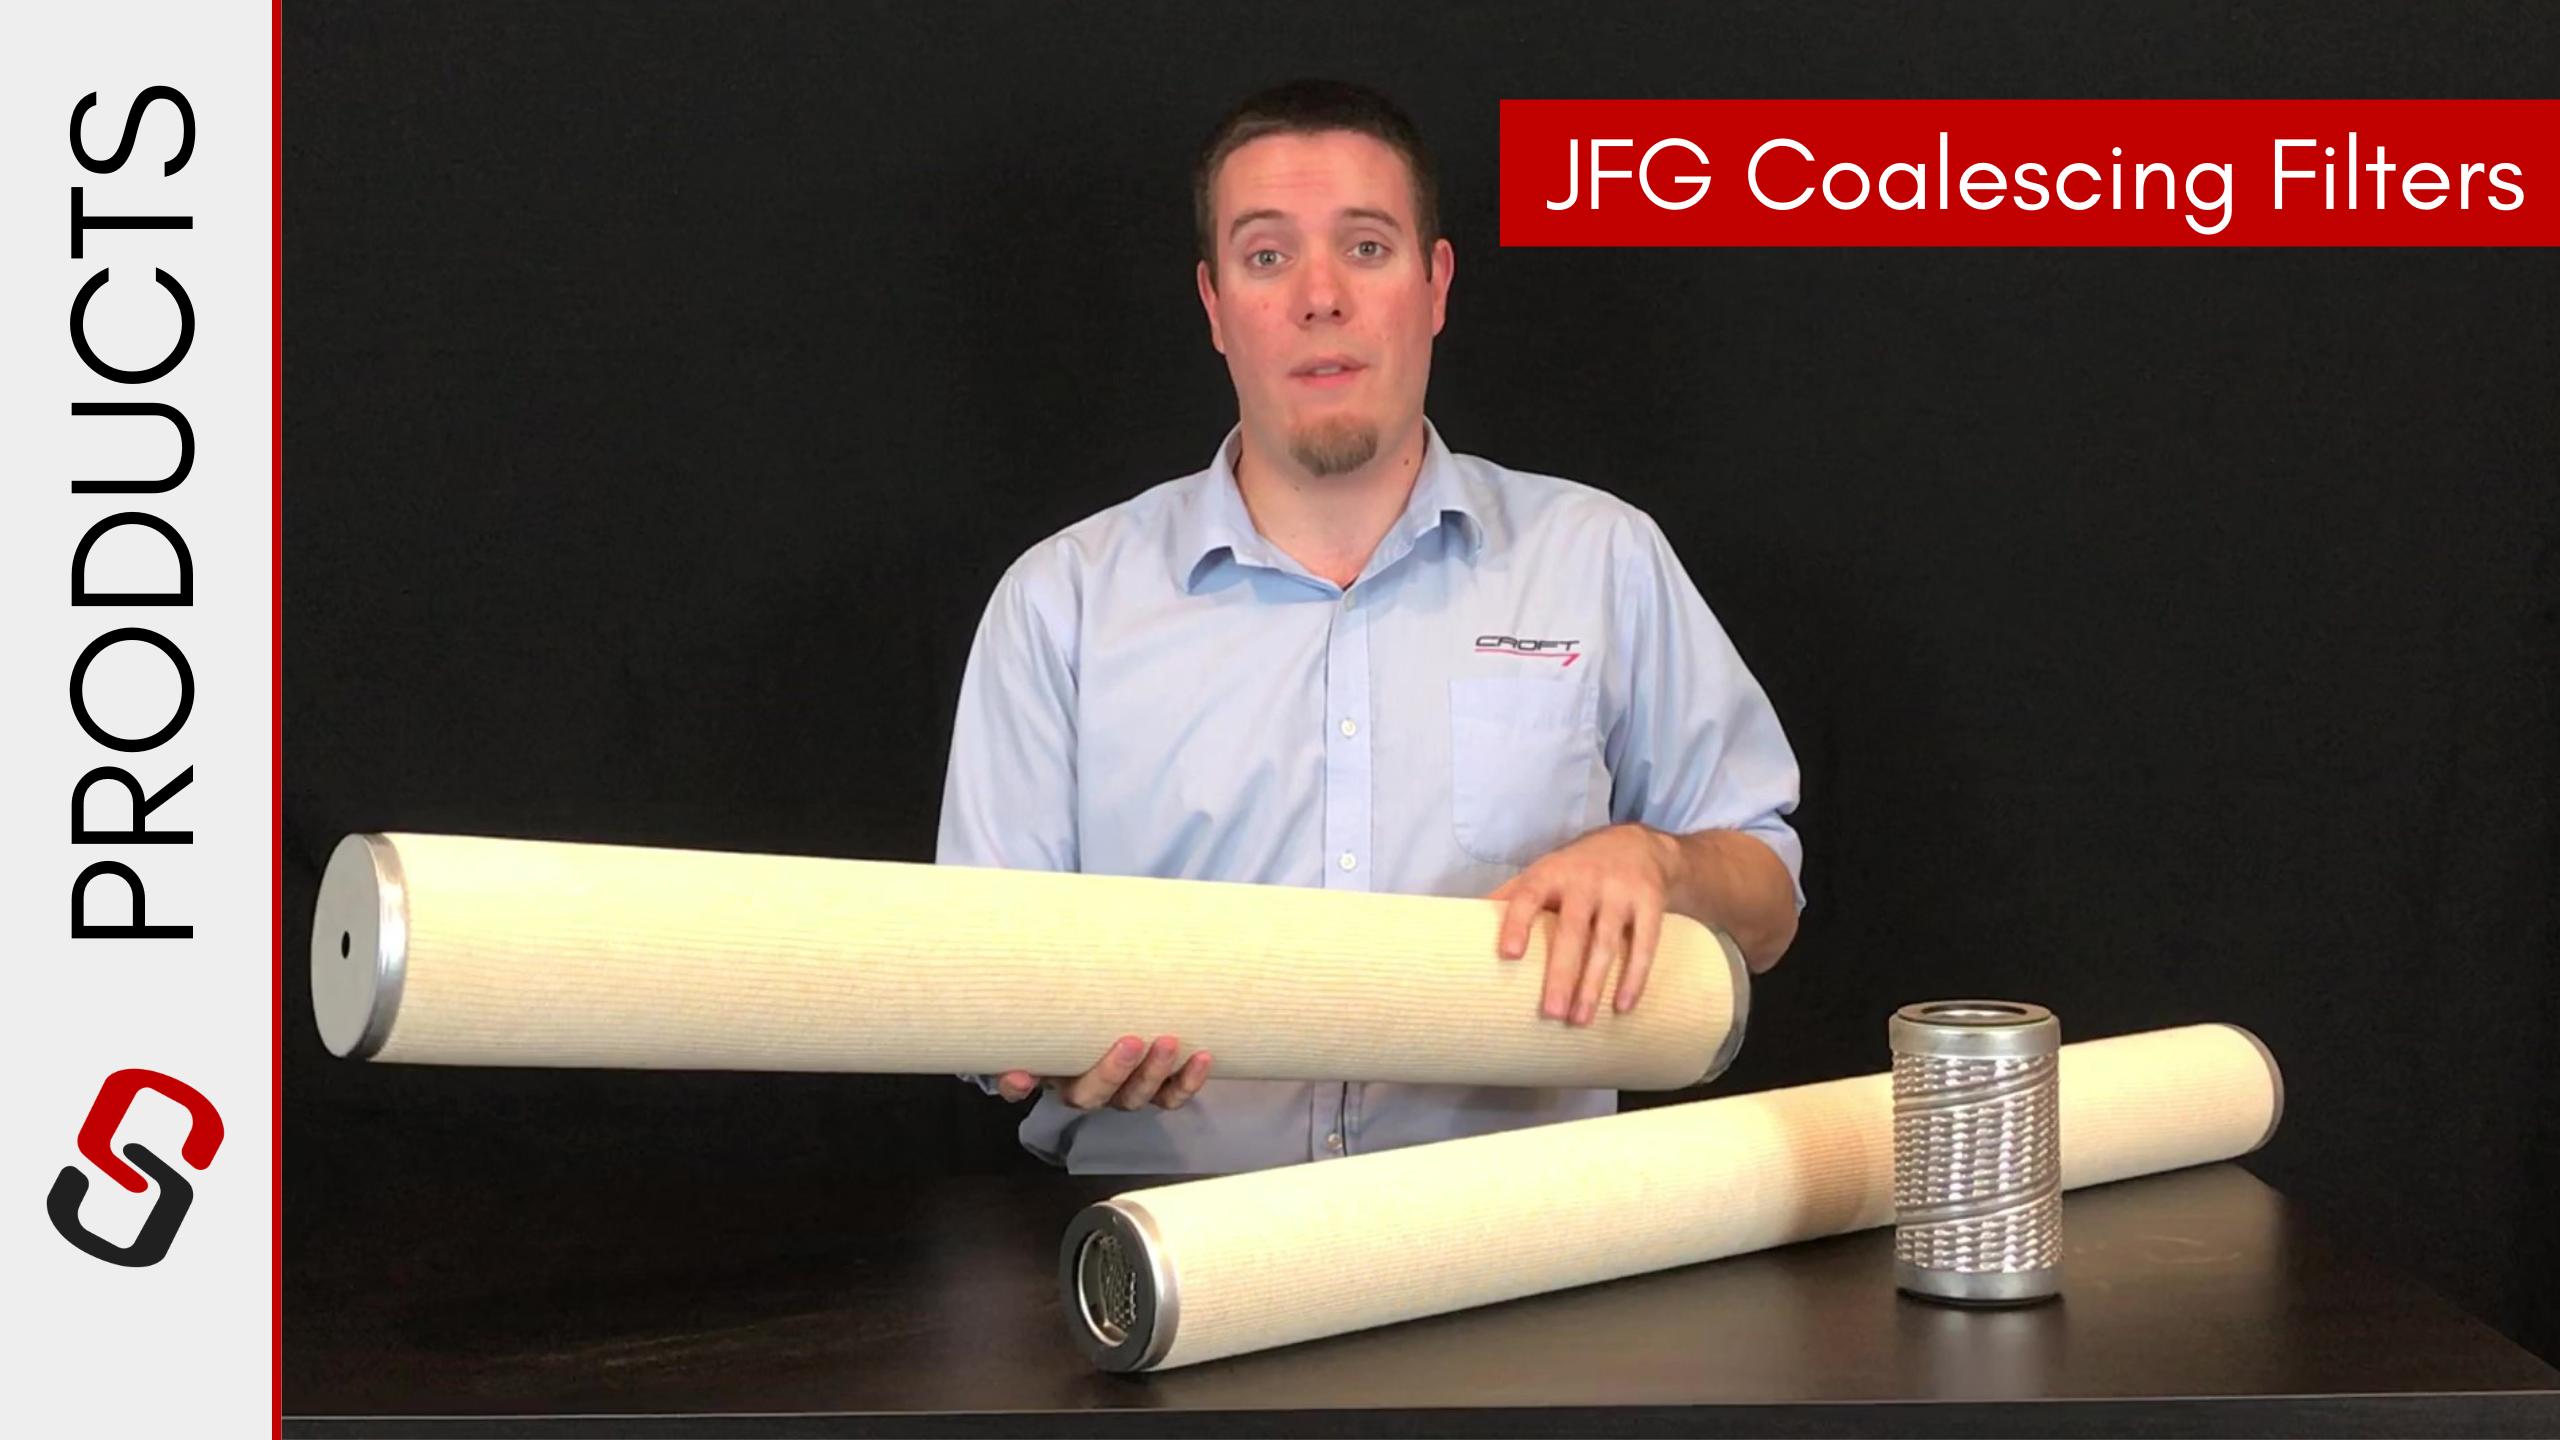 JFG Coalescing Filters | Product Video